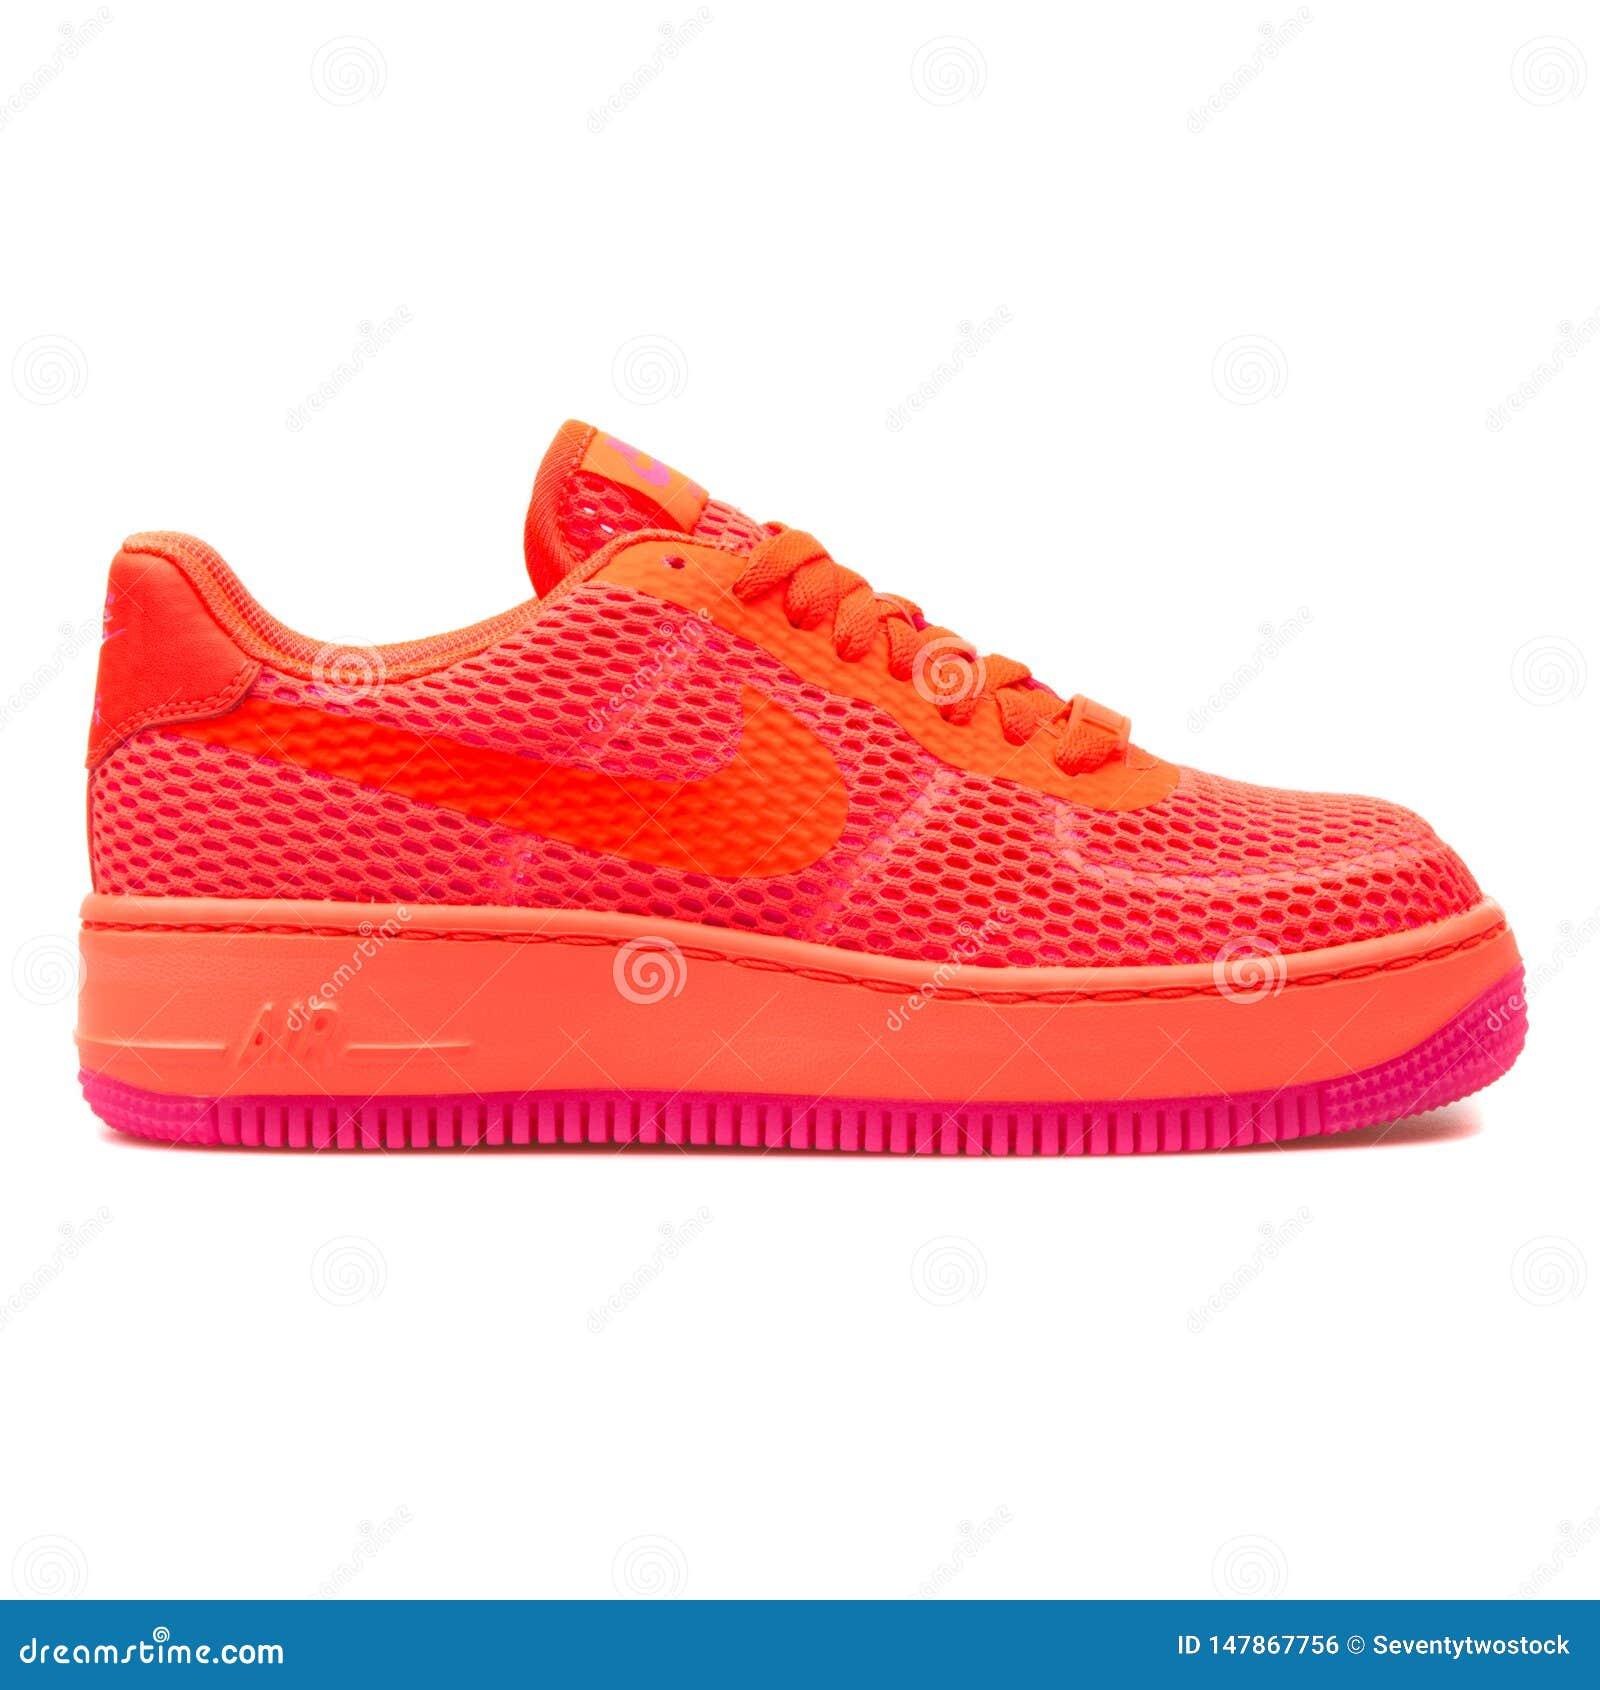 Nike Air Force 1 Low Upstep BR Total